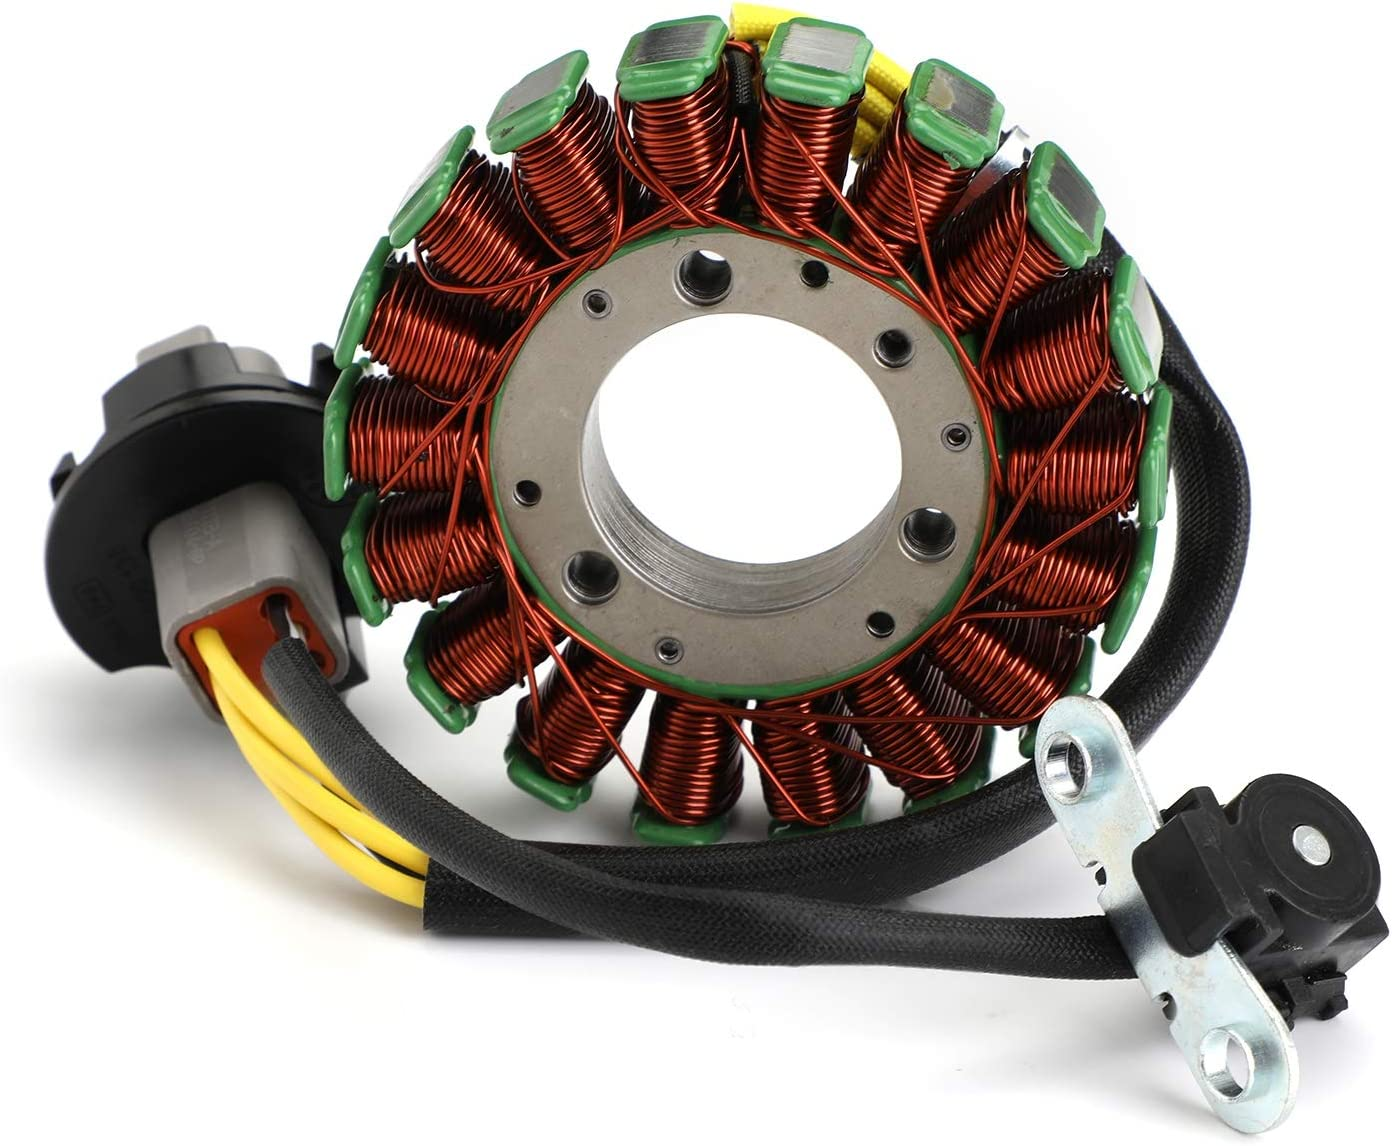 Topteng Stator Magneto For Sea-Doo 800 951 GTX GSX SPX RX XP 95-03 290886588//420886588